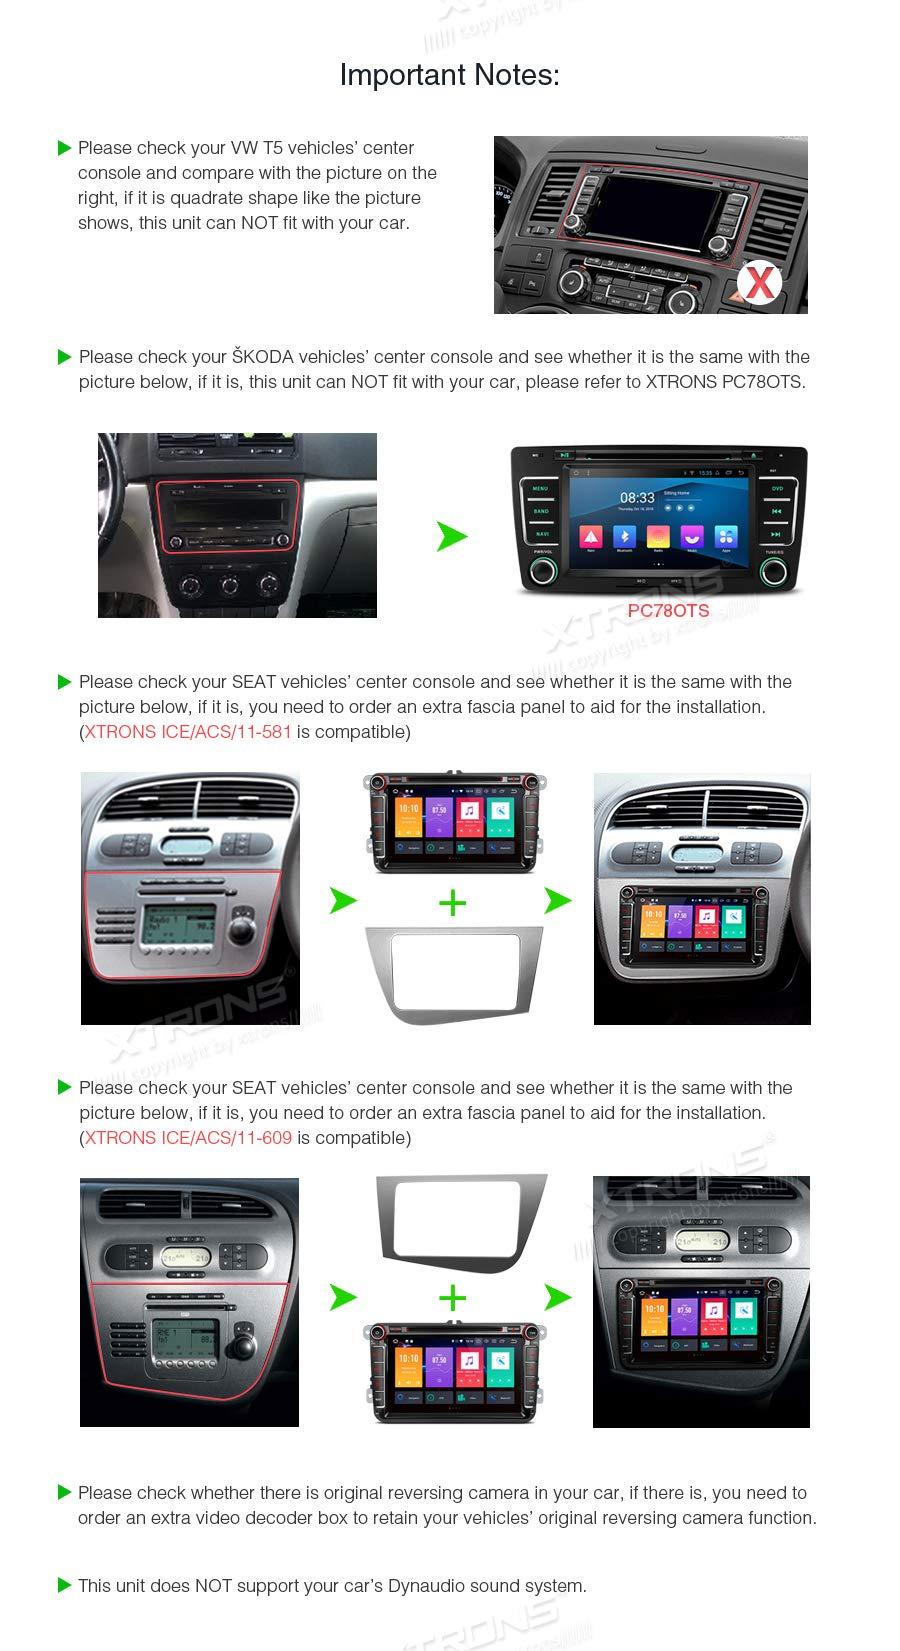 XTRONS-8-Android-90-4GB-RAM-64GB-ROM-Octa-Core-Autoradio-mit-Touchscreen-DVD-Player-untersttzt-4G-WiFi-Bluetooth-DAB-OBD2-CAR-Auto-Play-TPMS-Musik-Streaming-FR-VWSEATSkoda